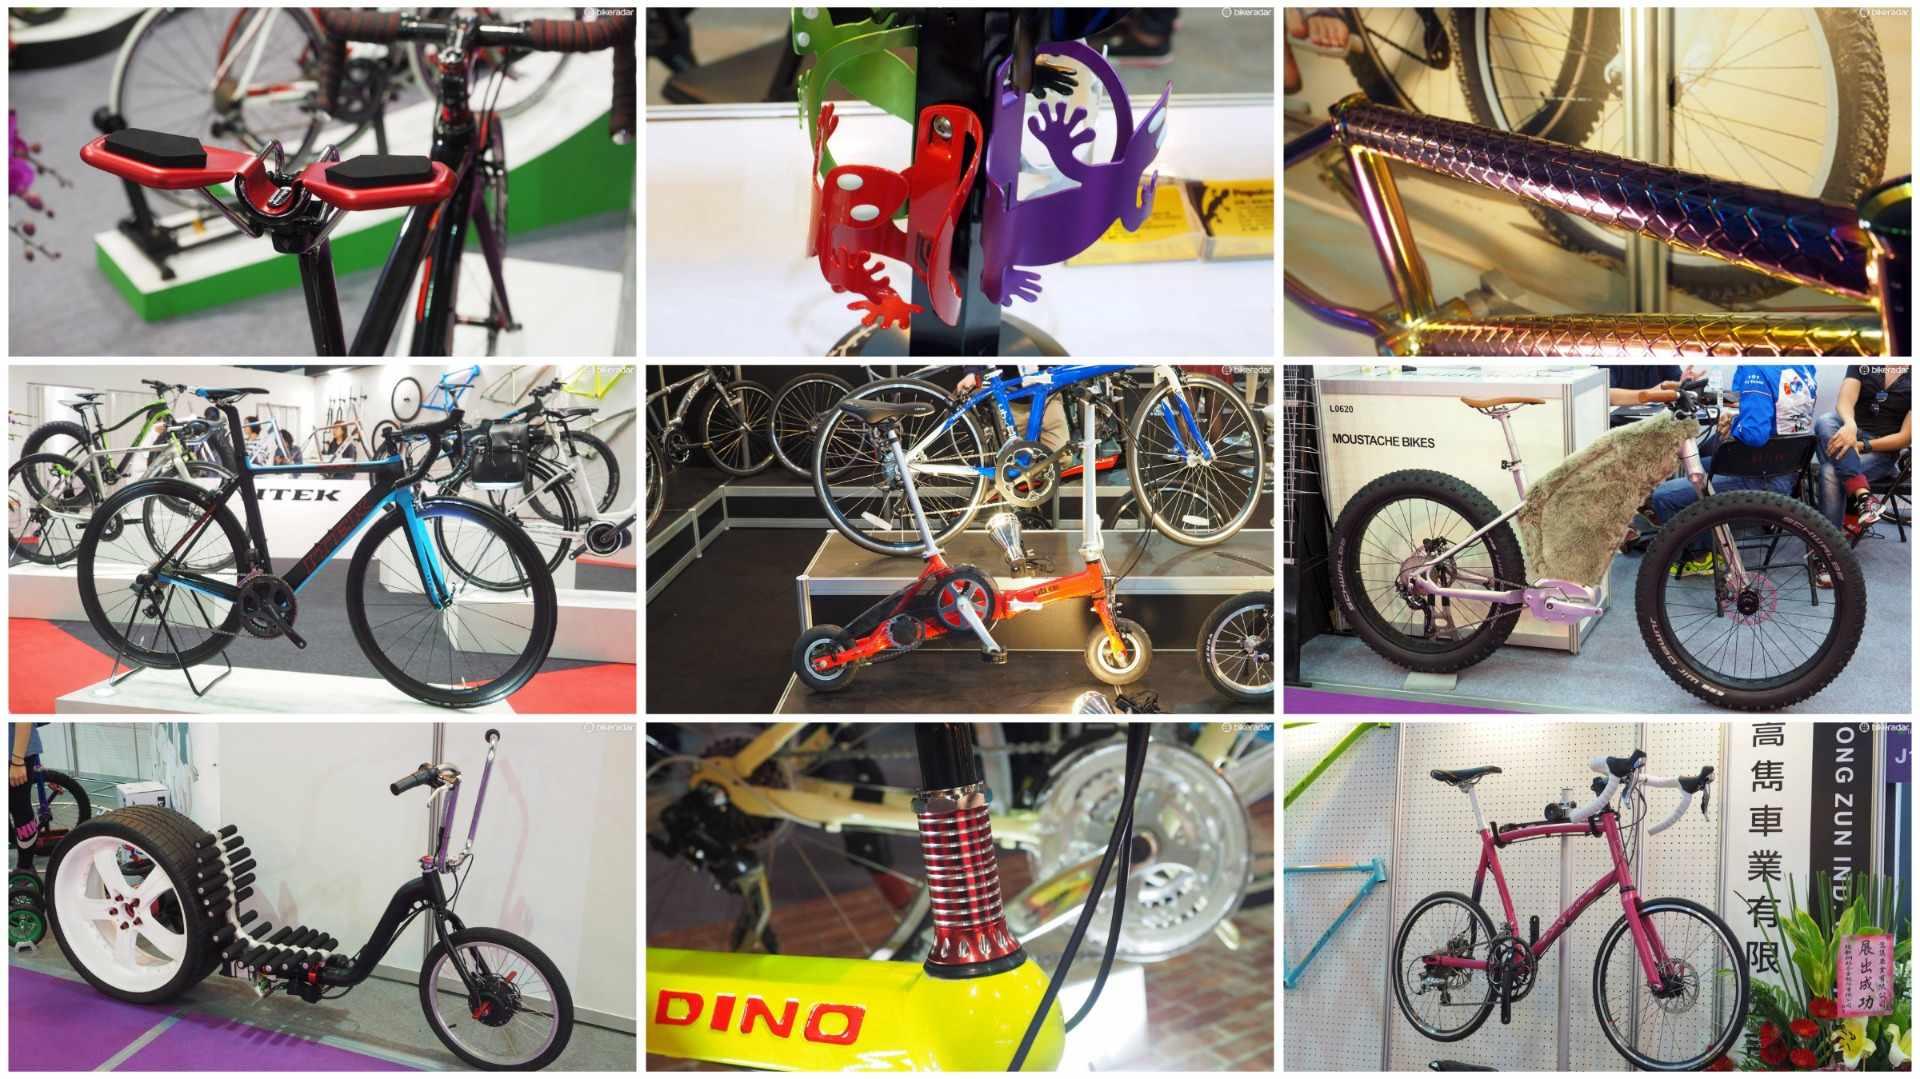 Taipei Cycle Show – the home of weird bike gear